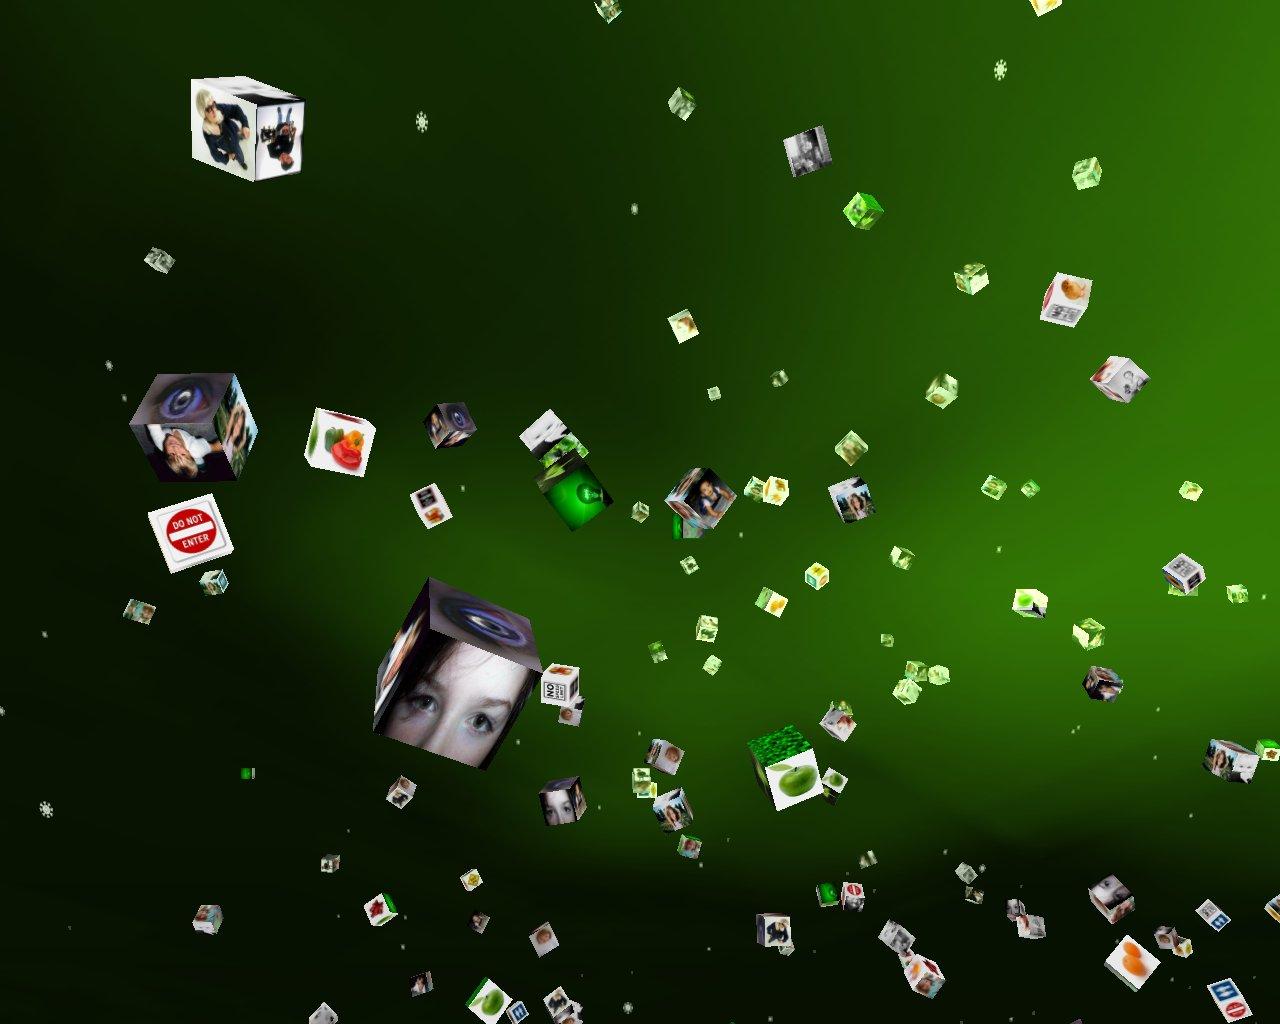 https://i2.wp.com/www.softpedia.com/screenshots/3D-Cube-Gallery_1.jpg